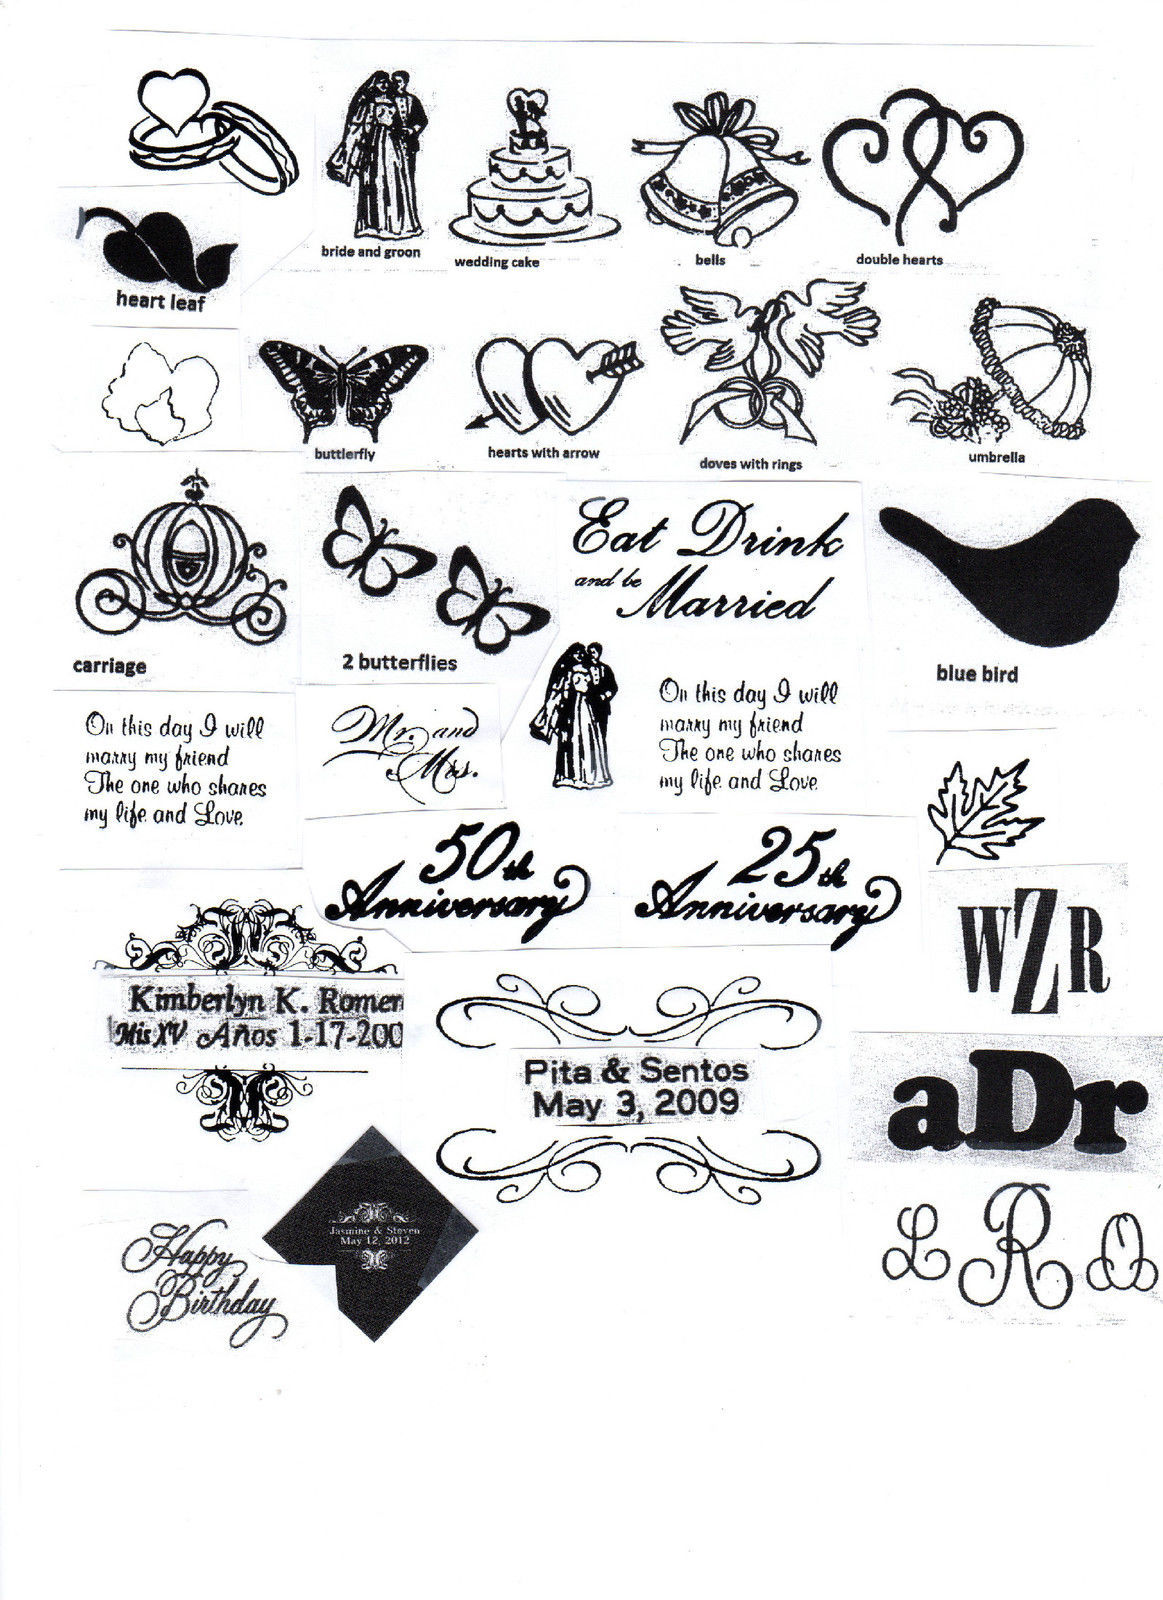 ROYAL FLUSH CARDS LOGO 50 Personalized printed DINNER HAND TOWEL FOLD napkins image 3